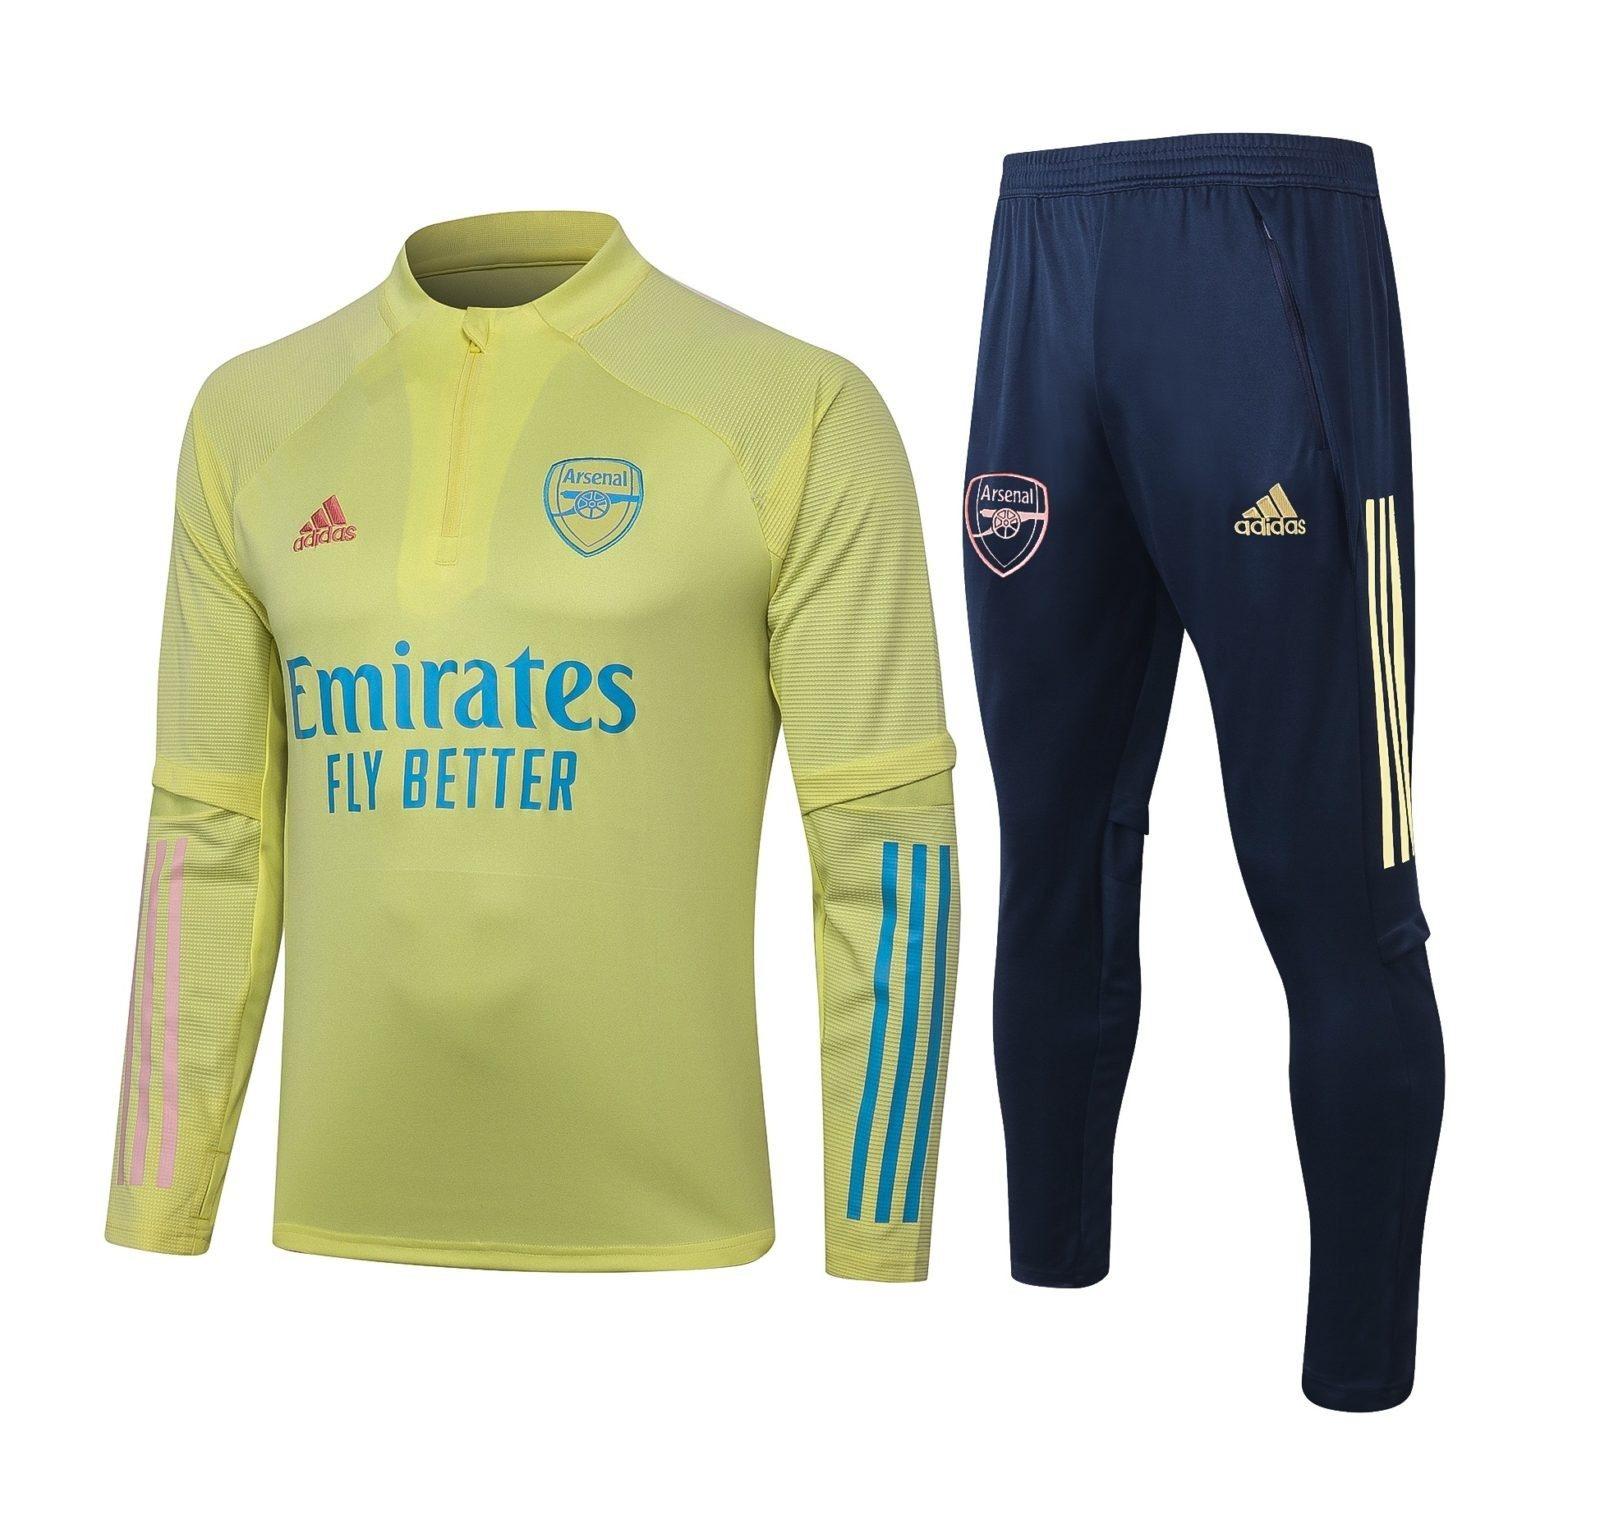 Спортивный костюм Арсенала сезон 2020-2021 арт.53003